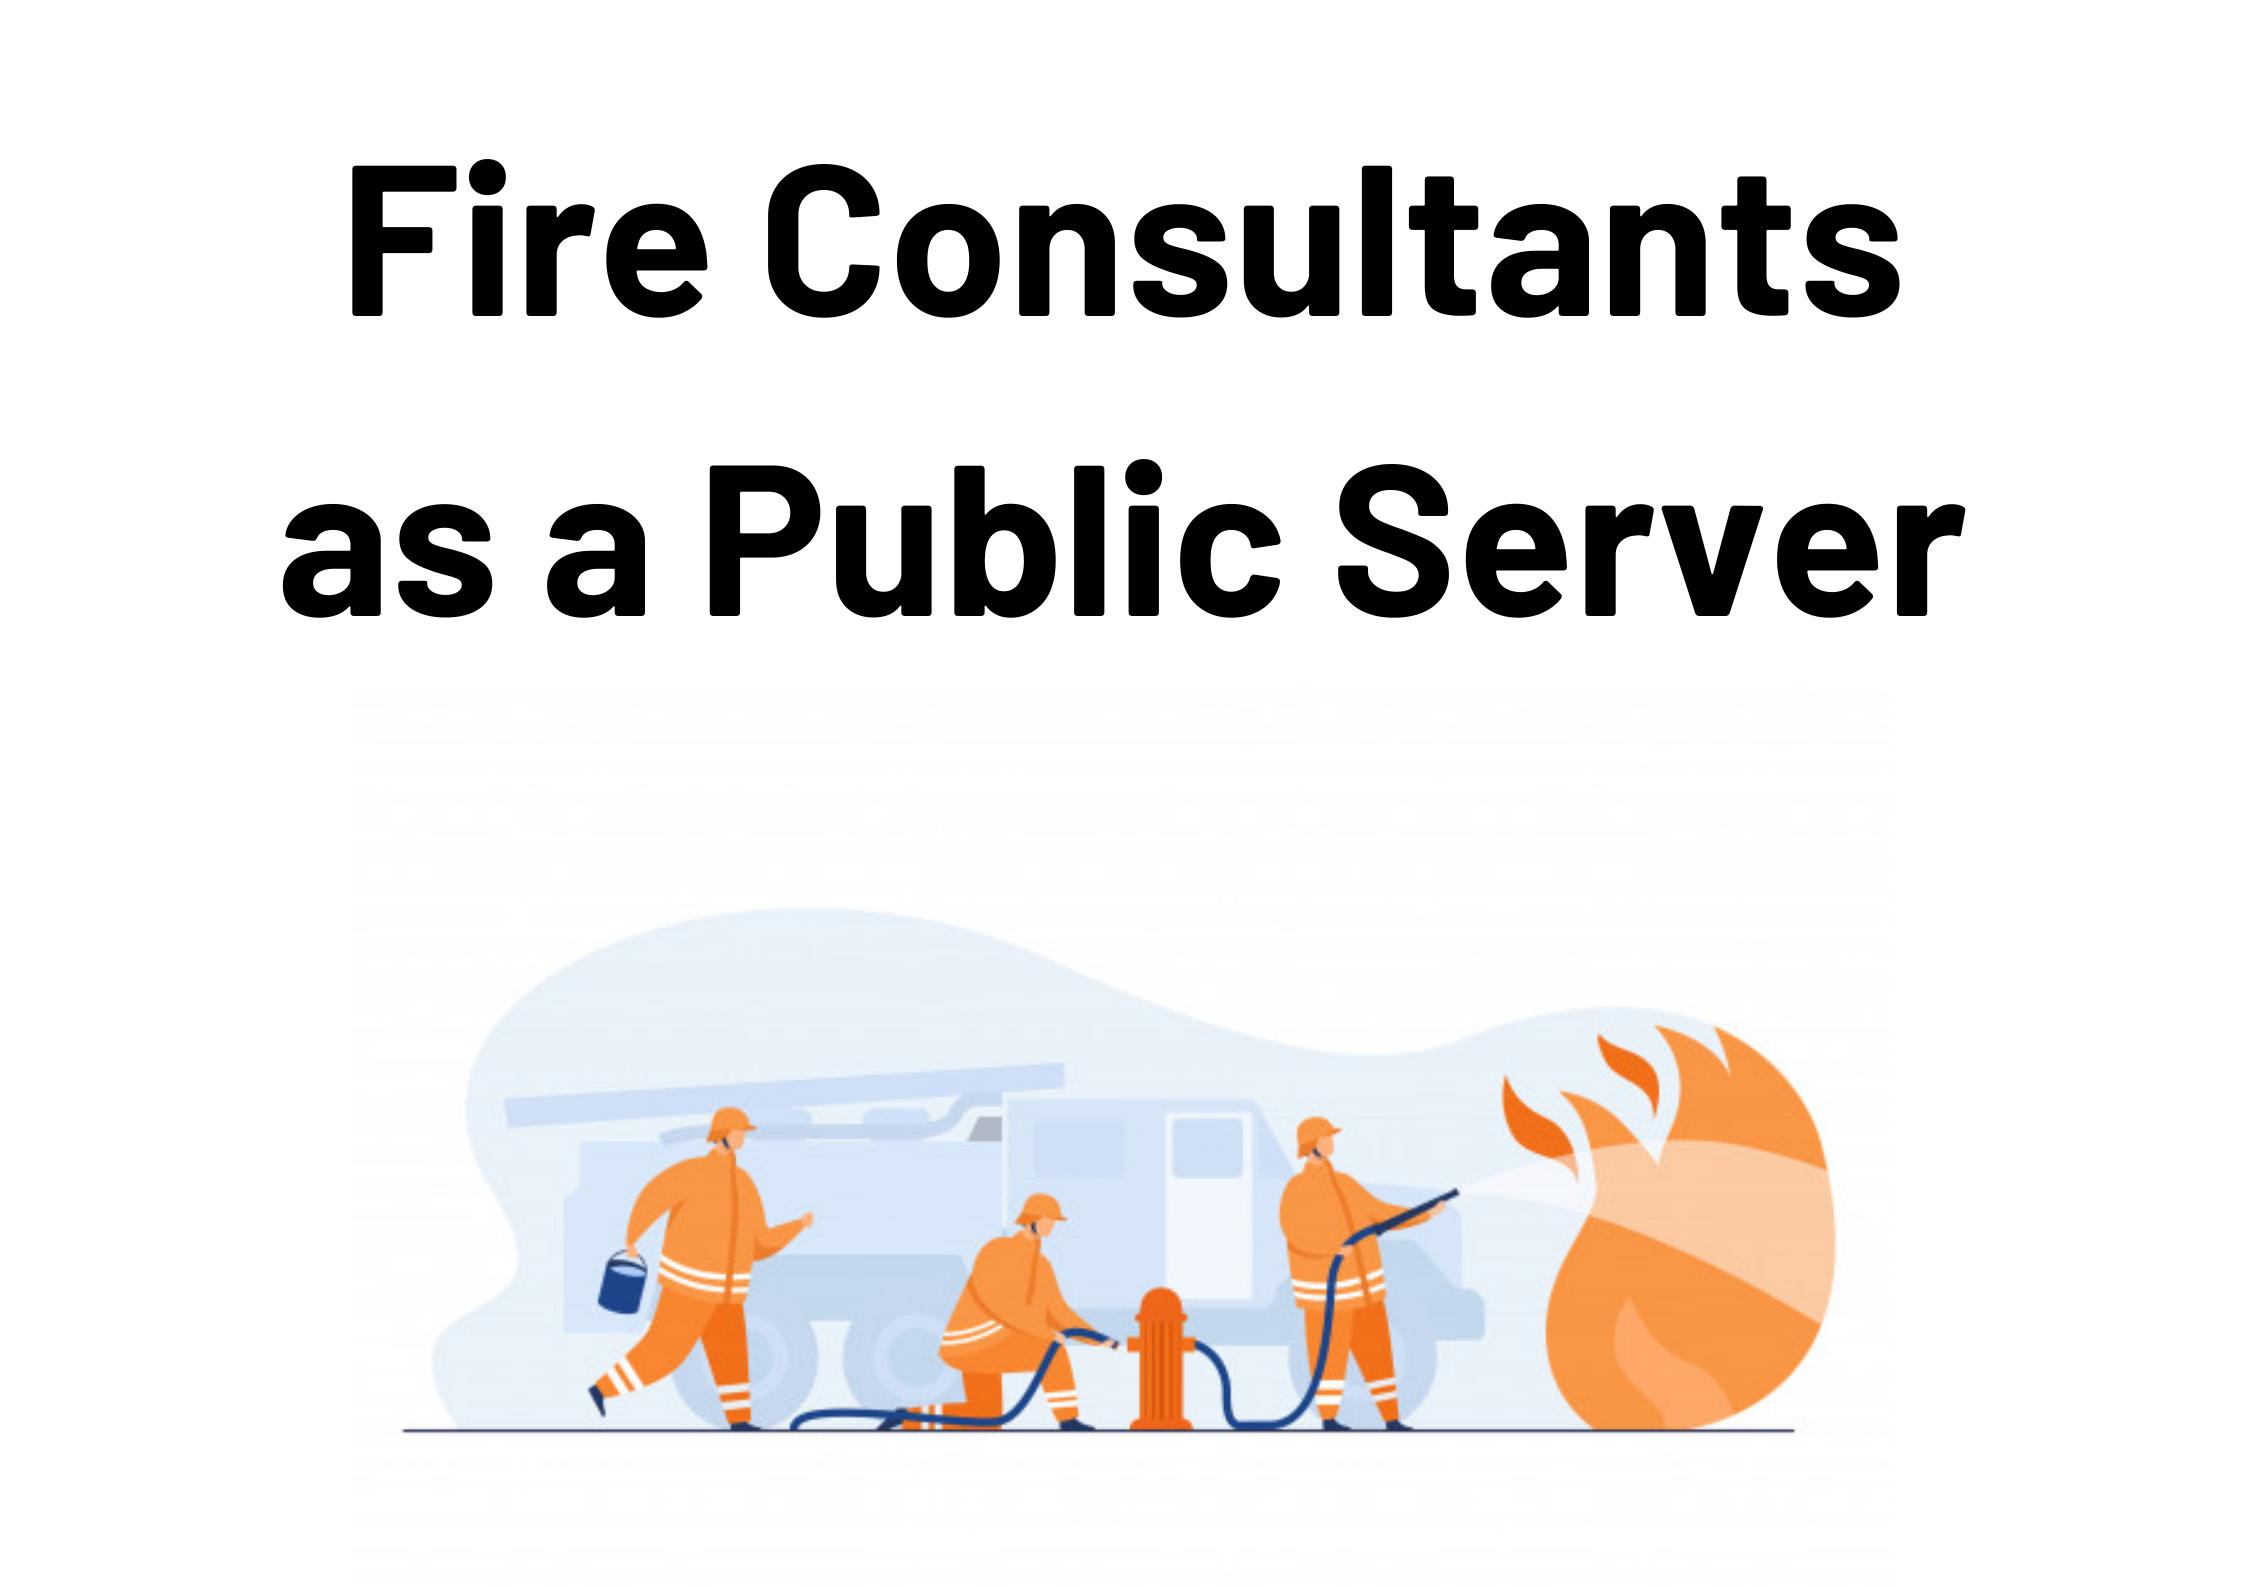 Fire-Consultants-as-a-Public-Server